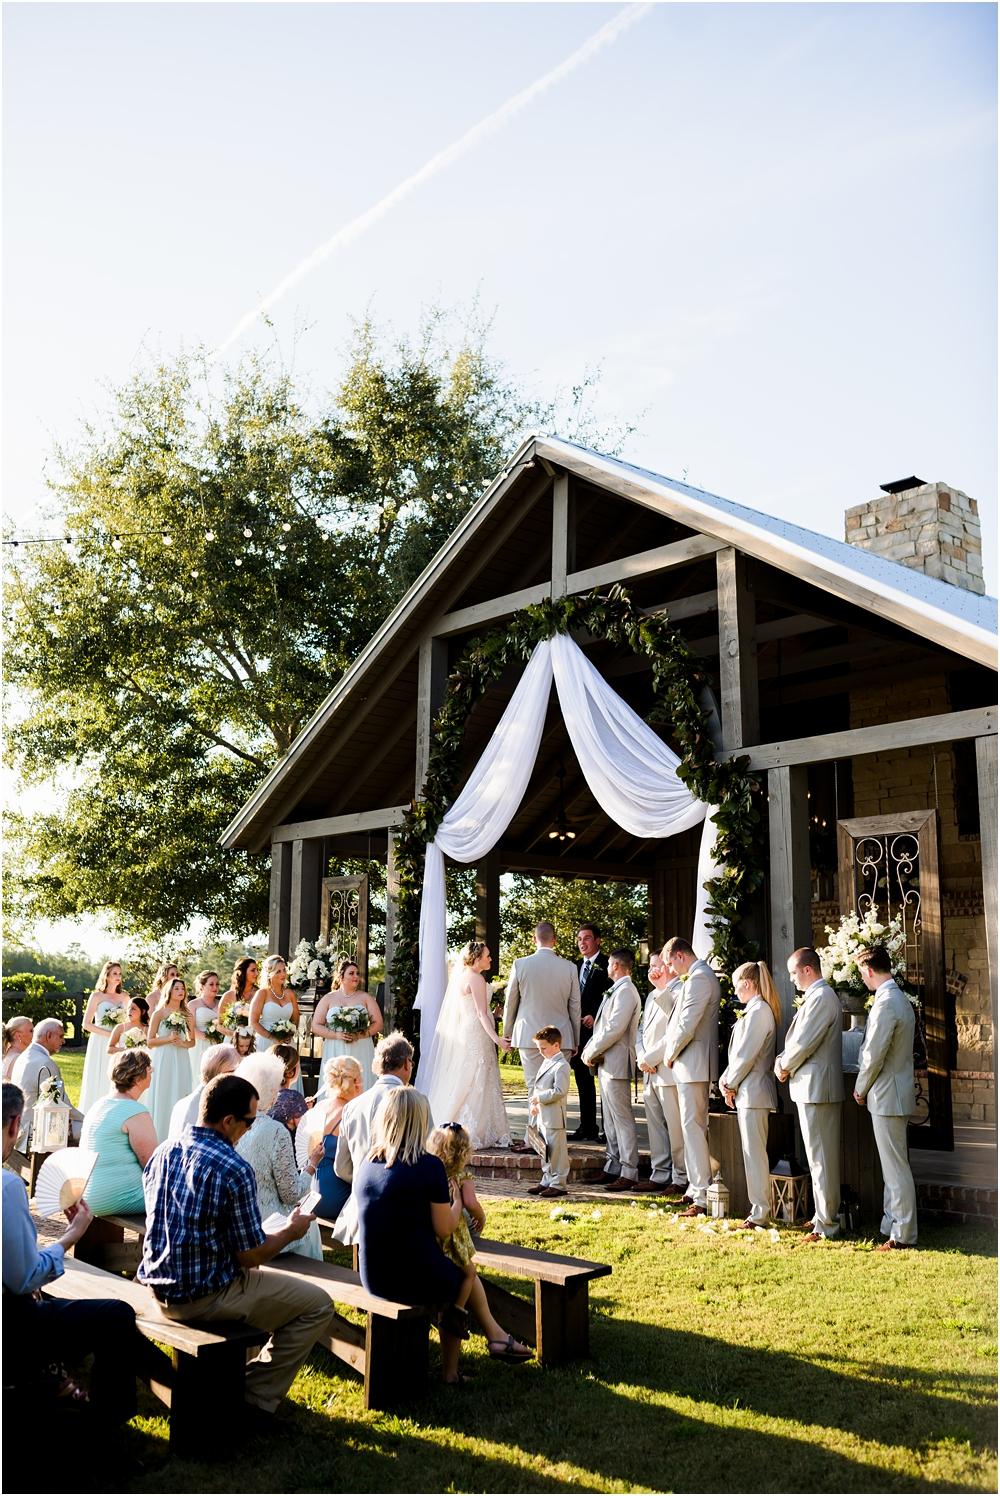 matthew-wedding-kiersten-stevenson-photography-30a-panama-city-beach-dothan-tallahassee-(240-of-579).JPG